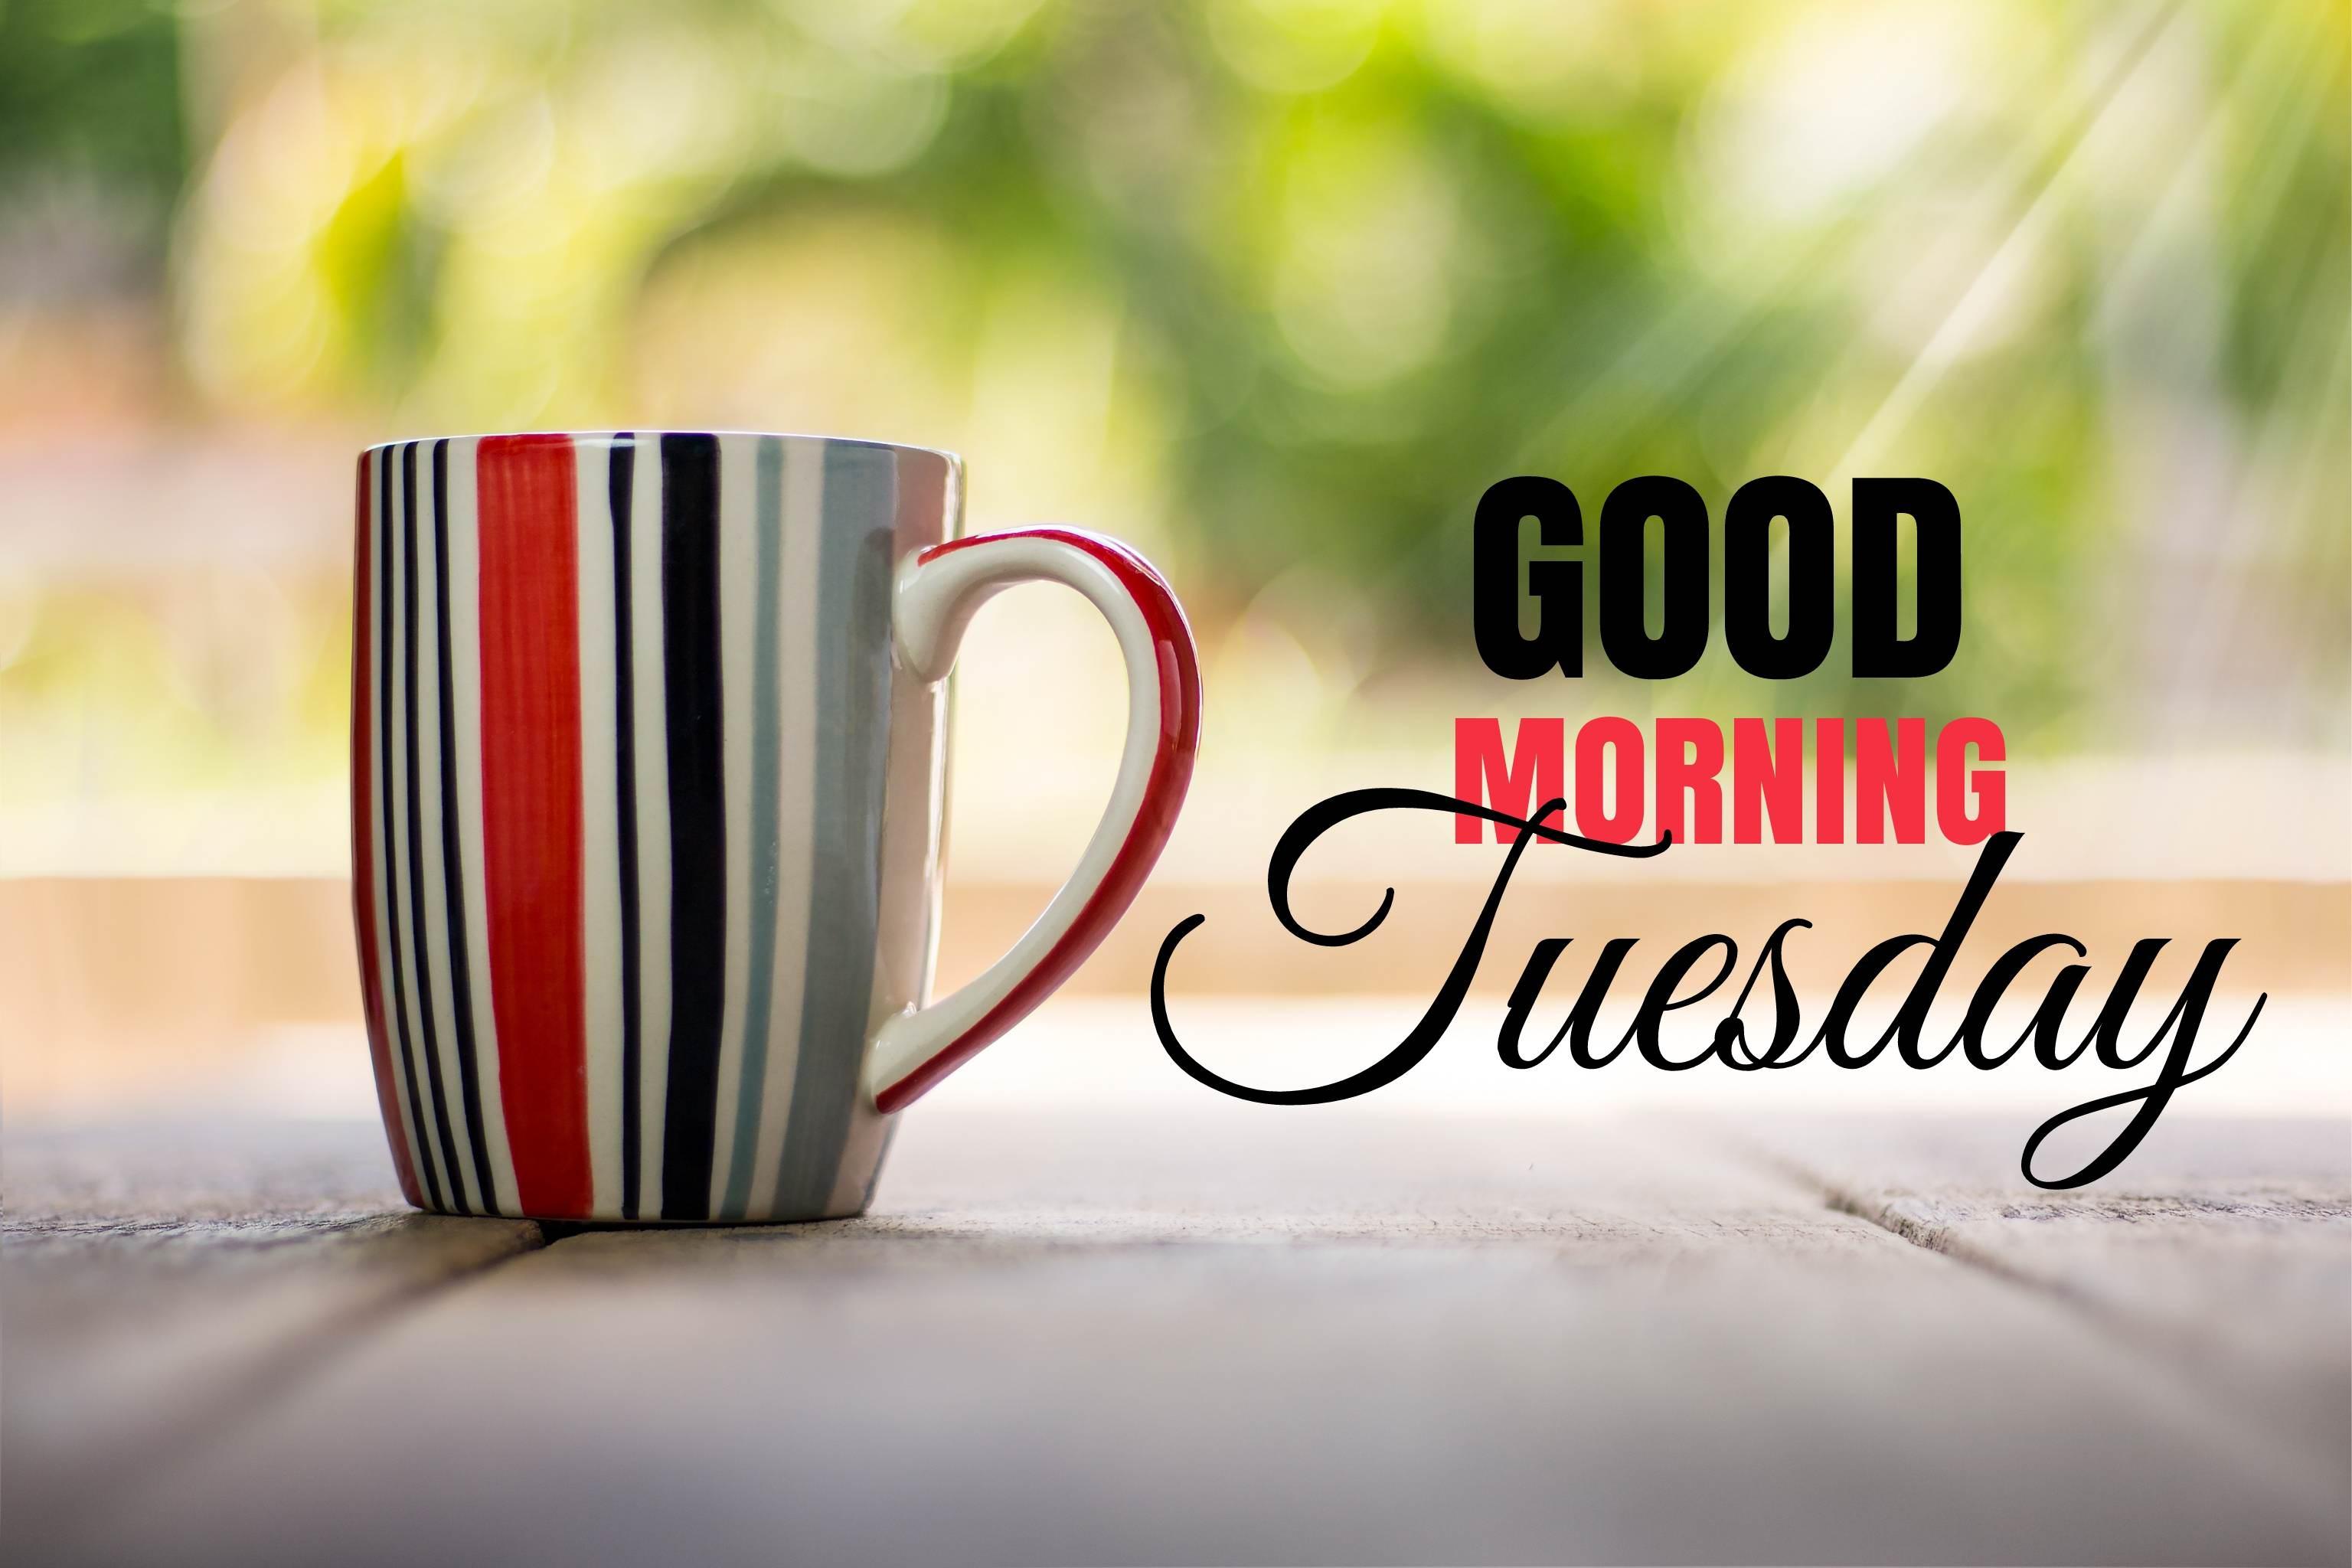 Good Morning Tuesday Wallpapers On Wallpaperdog